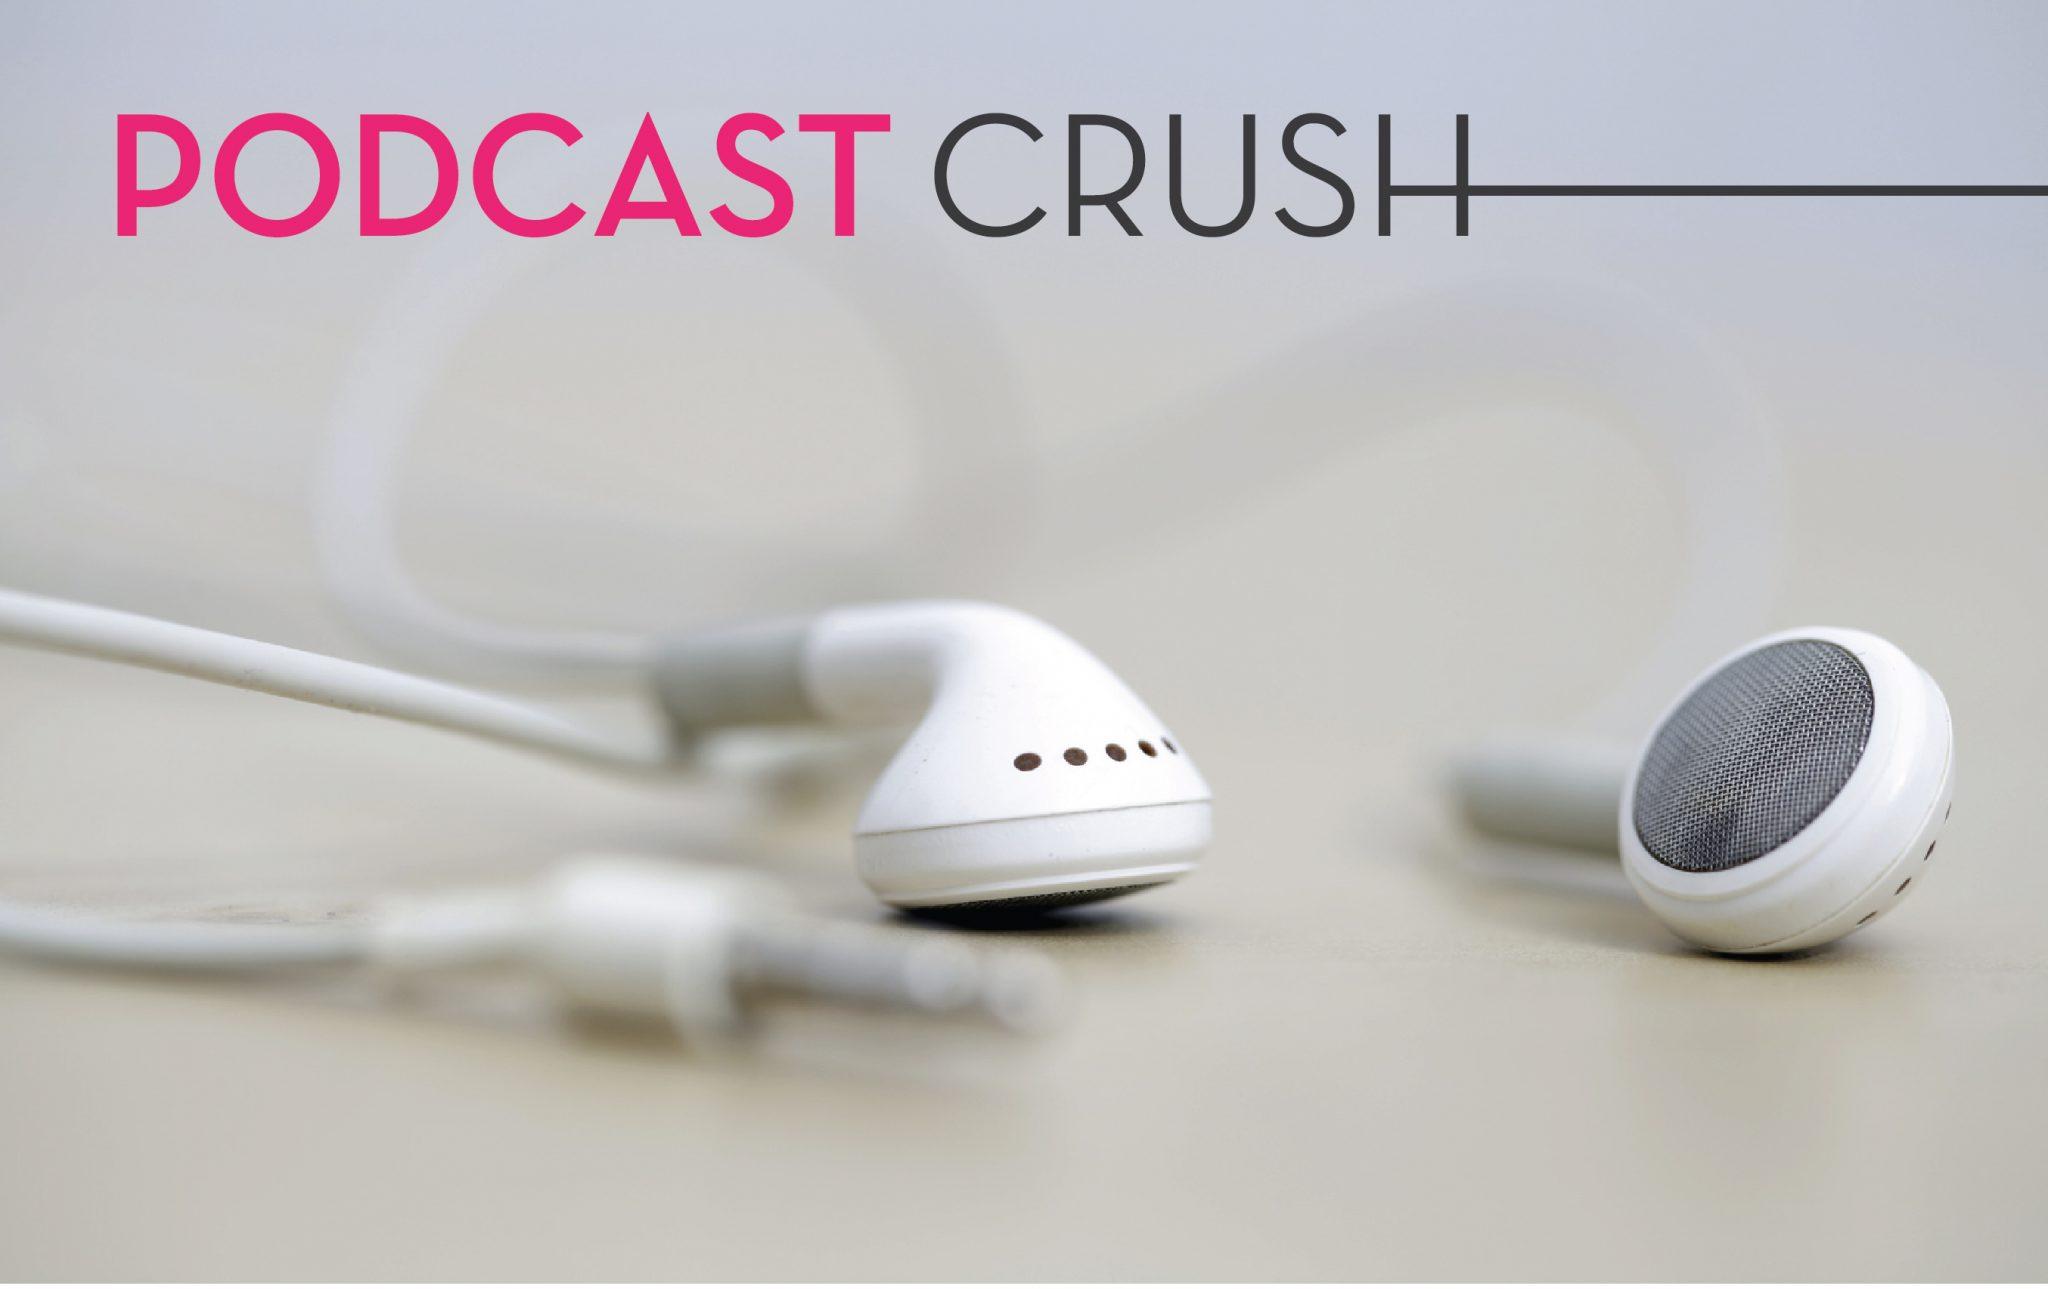 Podcast Crush: Volume 1